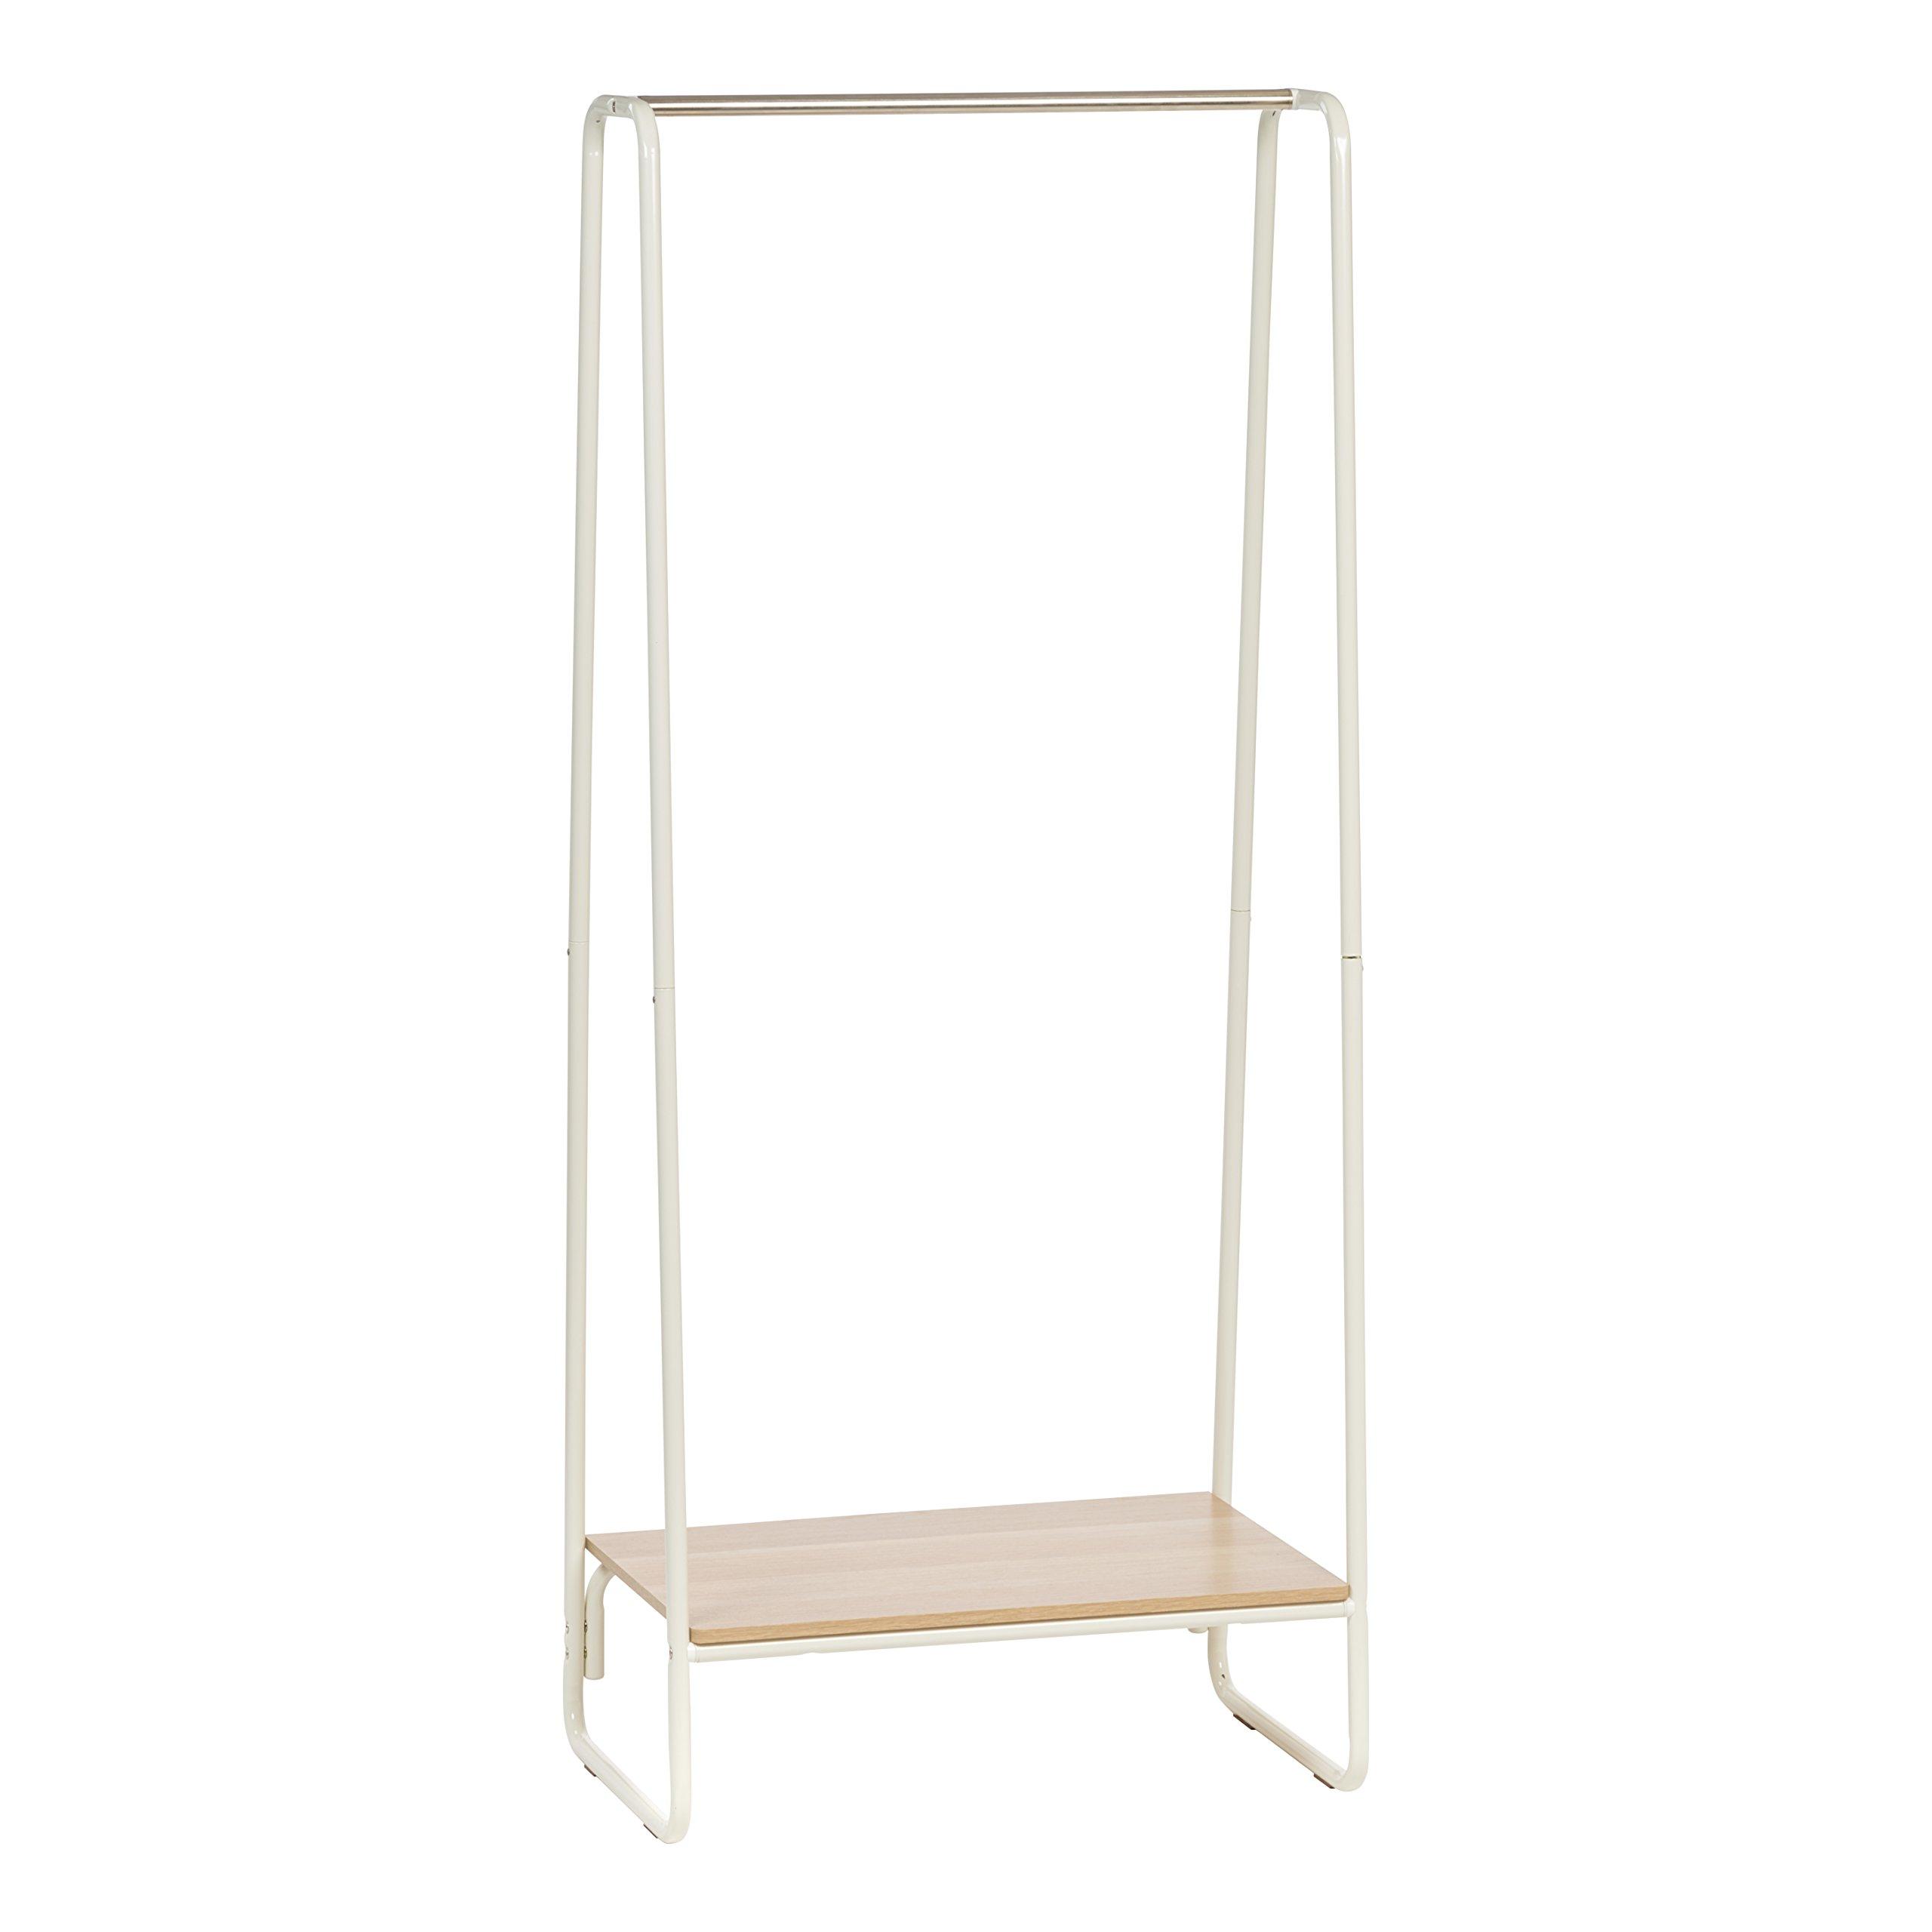 IRIS Metal Garment Rack with Wood Shelf, White and Light Brown